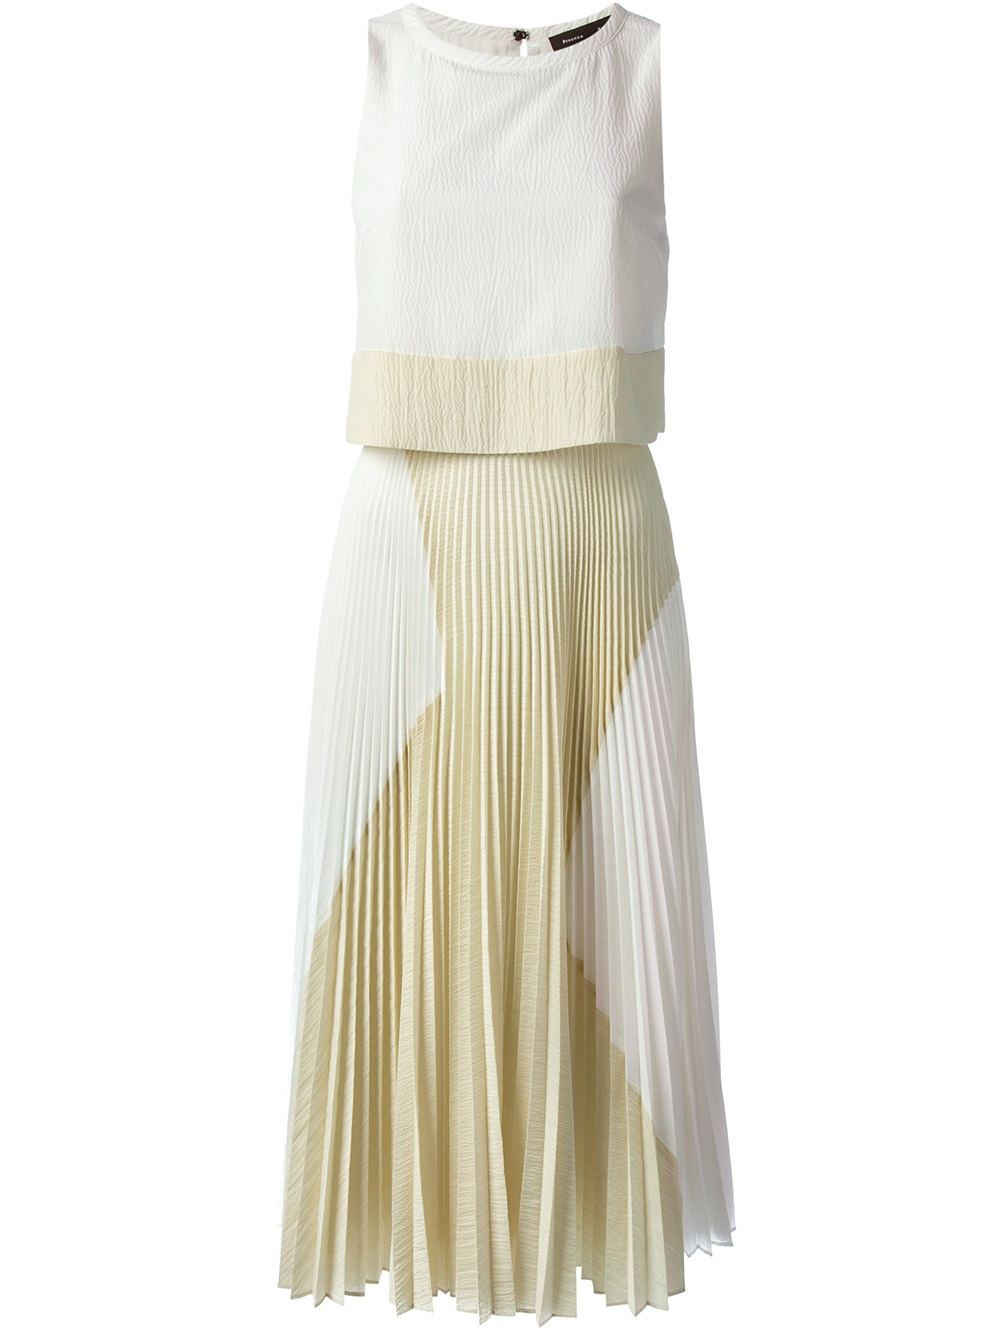 proenza schouler pleated skirt dress in beige